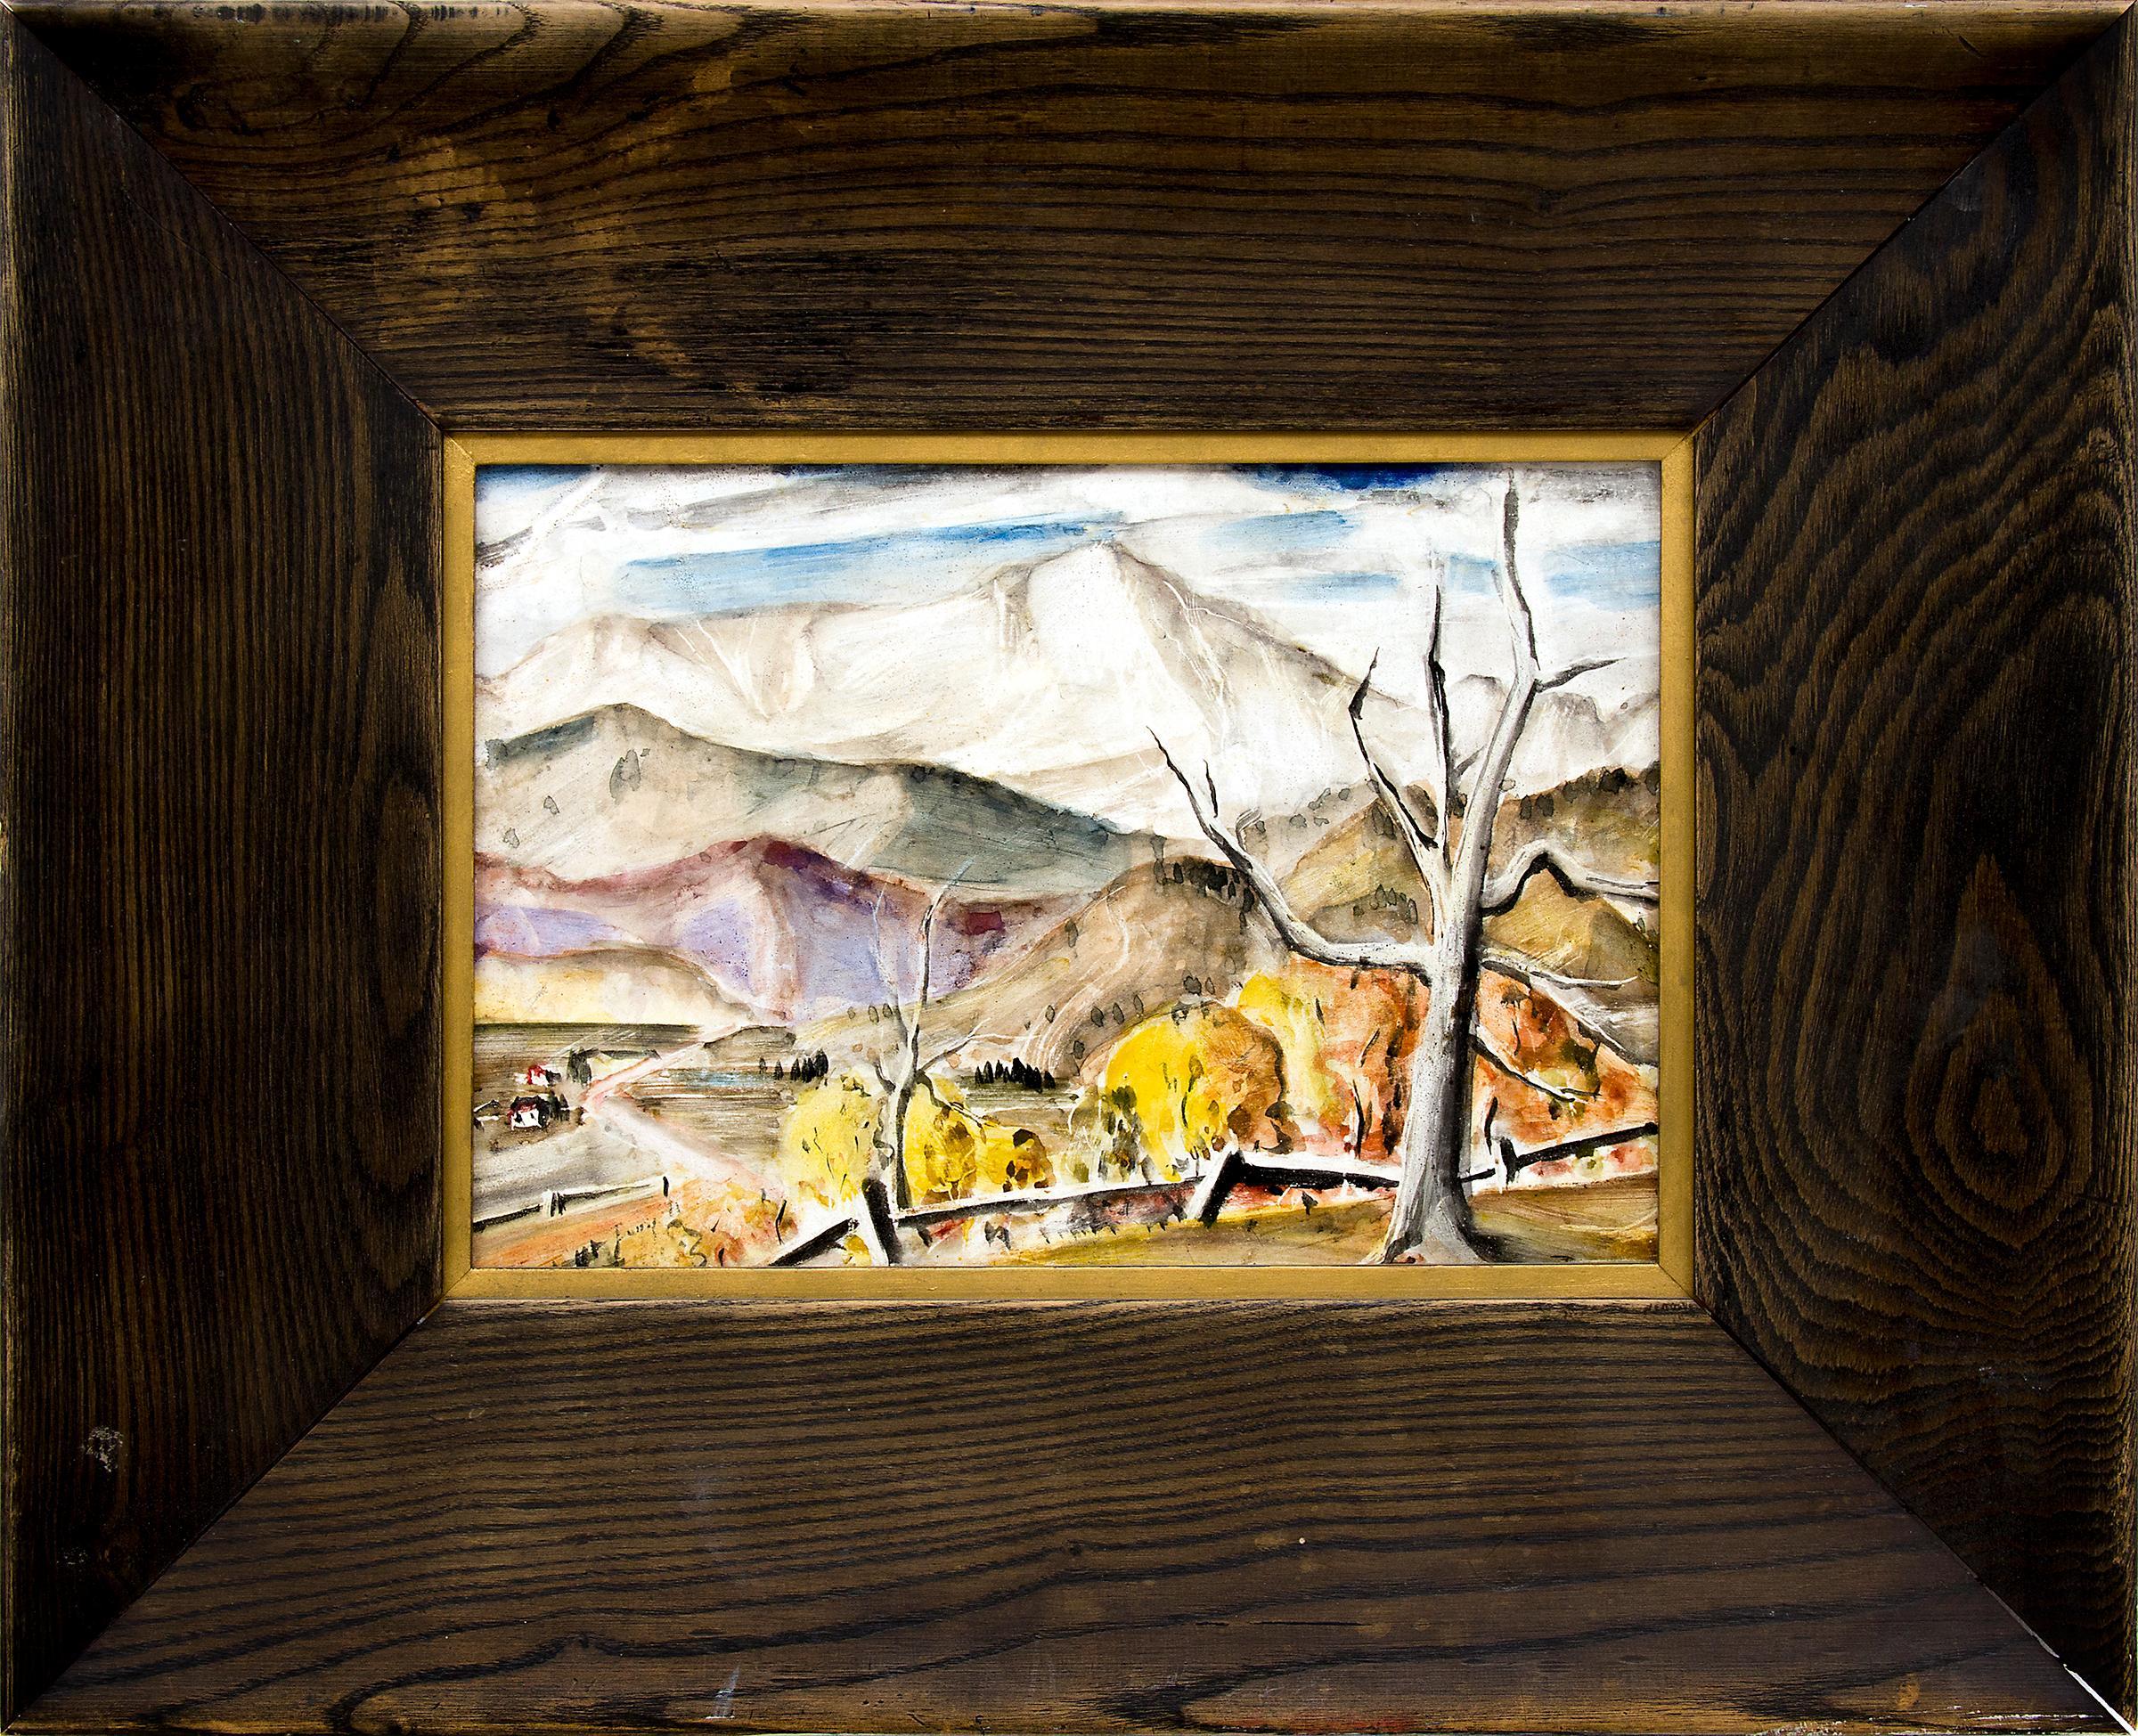 Pikes Peak (Vintage 1930s Colorado Mountain Landscape in Autumn)